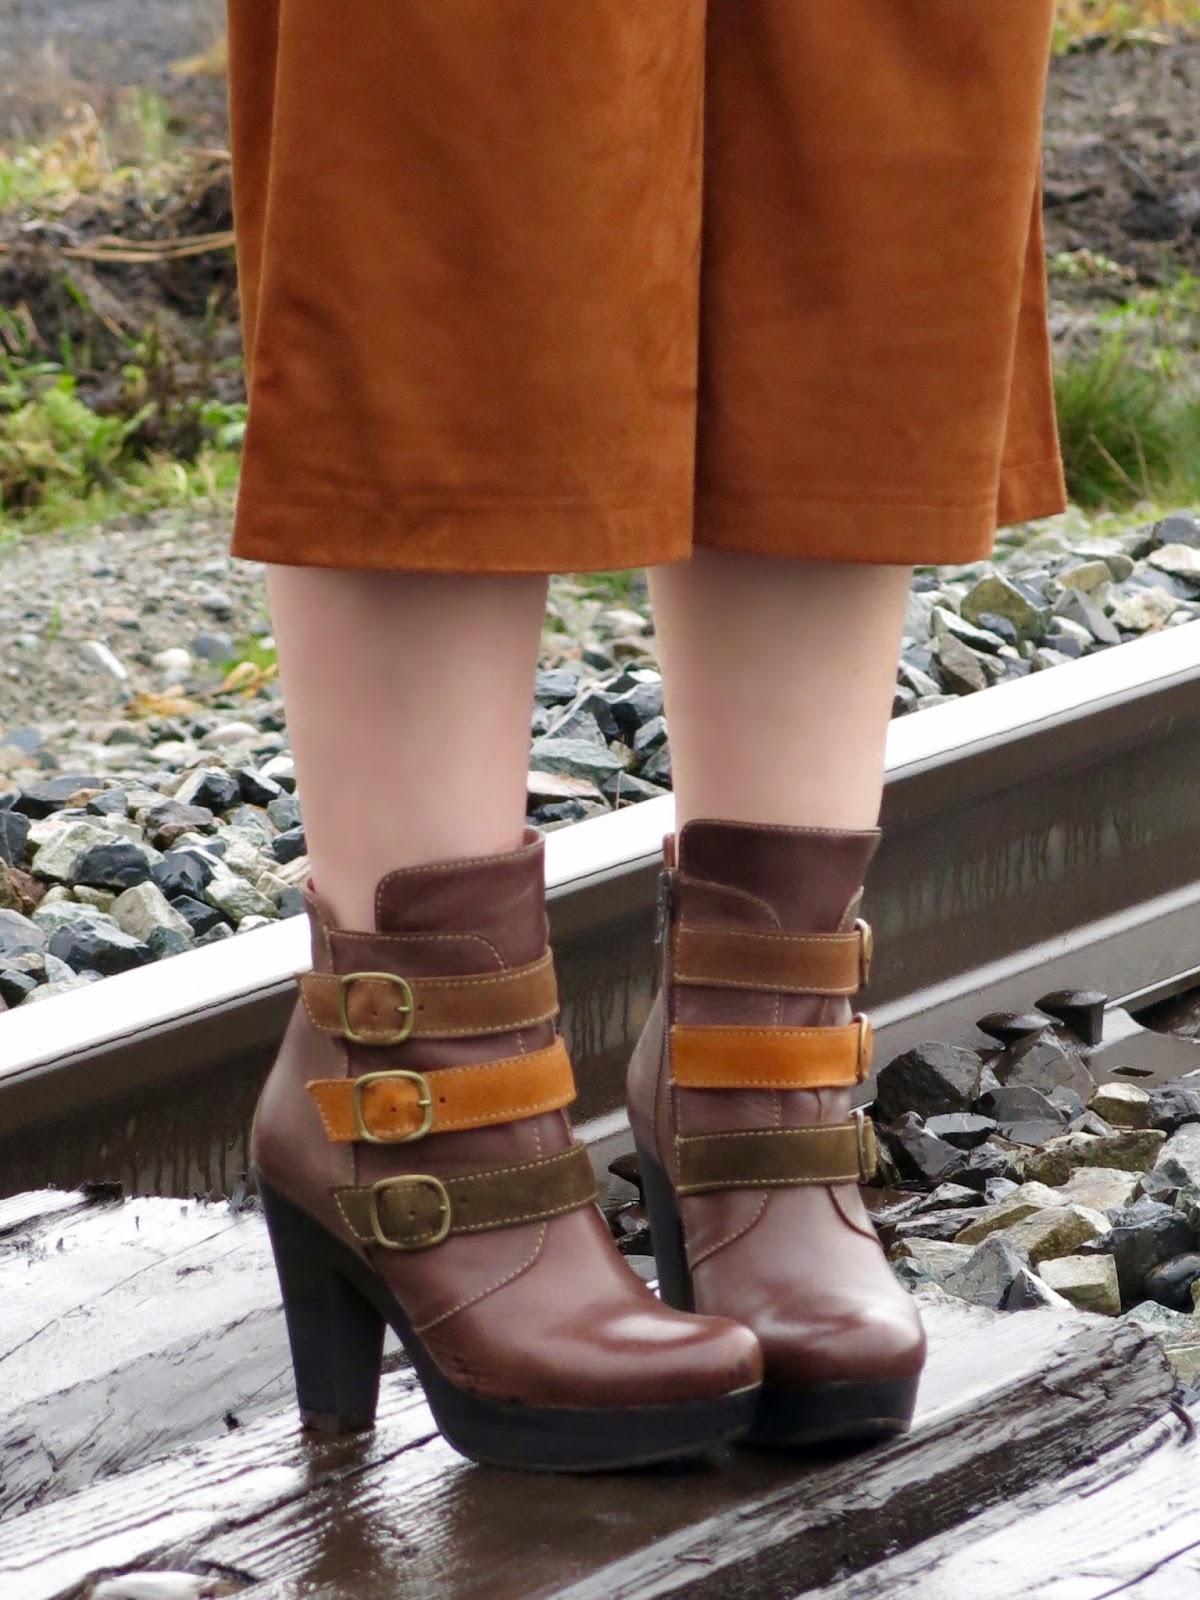 faux-suede culottes, Bruna platform booties